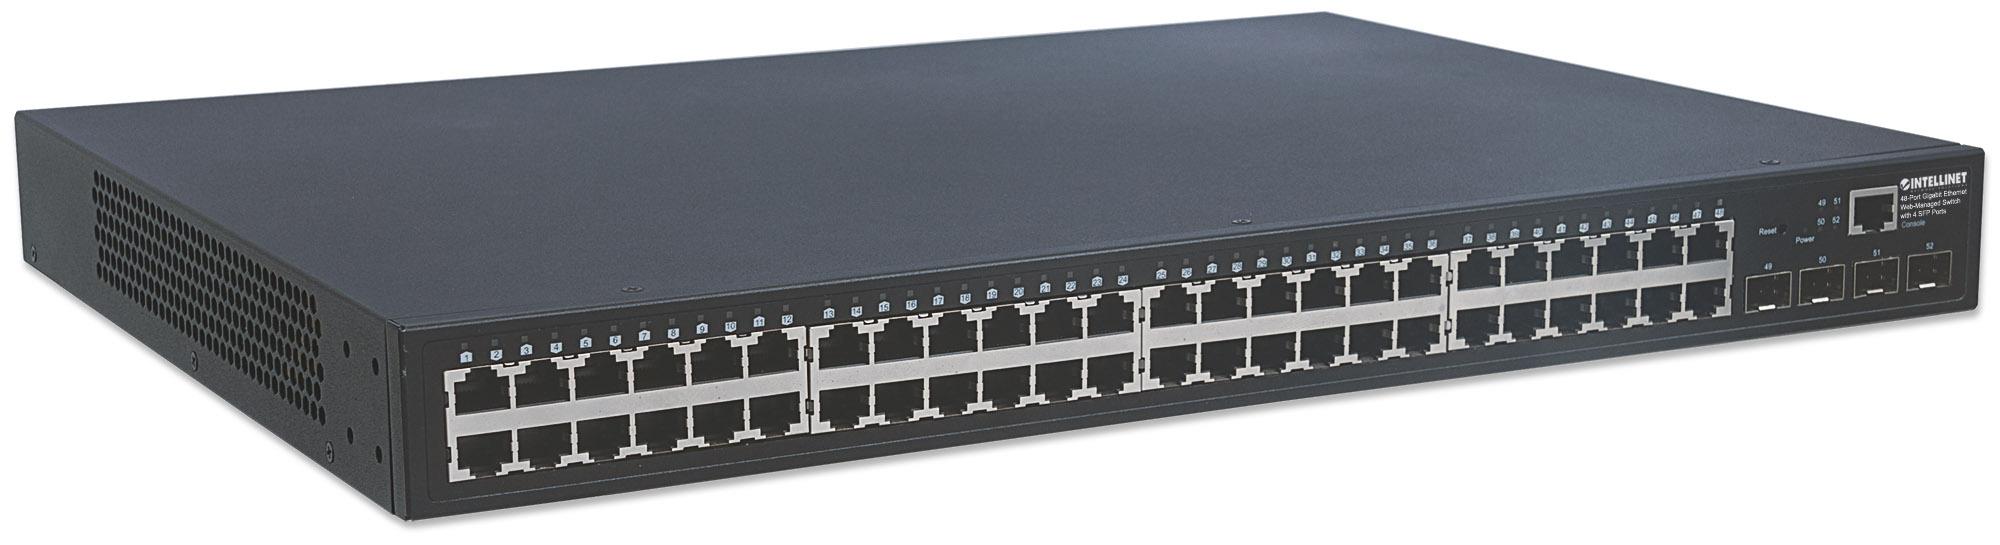 48-Port Gigabit Ethernet Web-Managed Switch with 4 SFP Ports